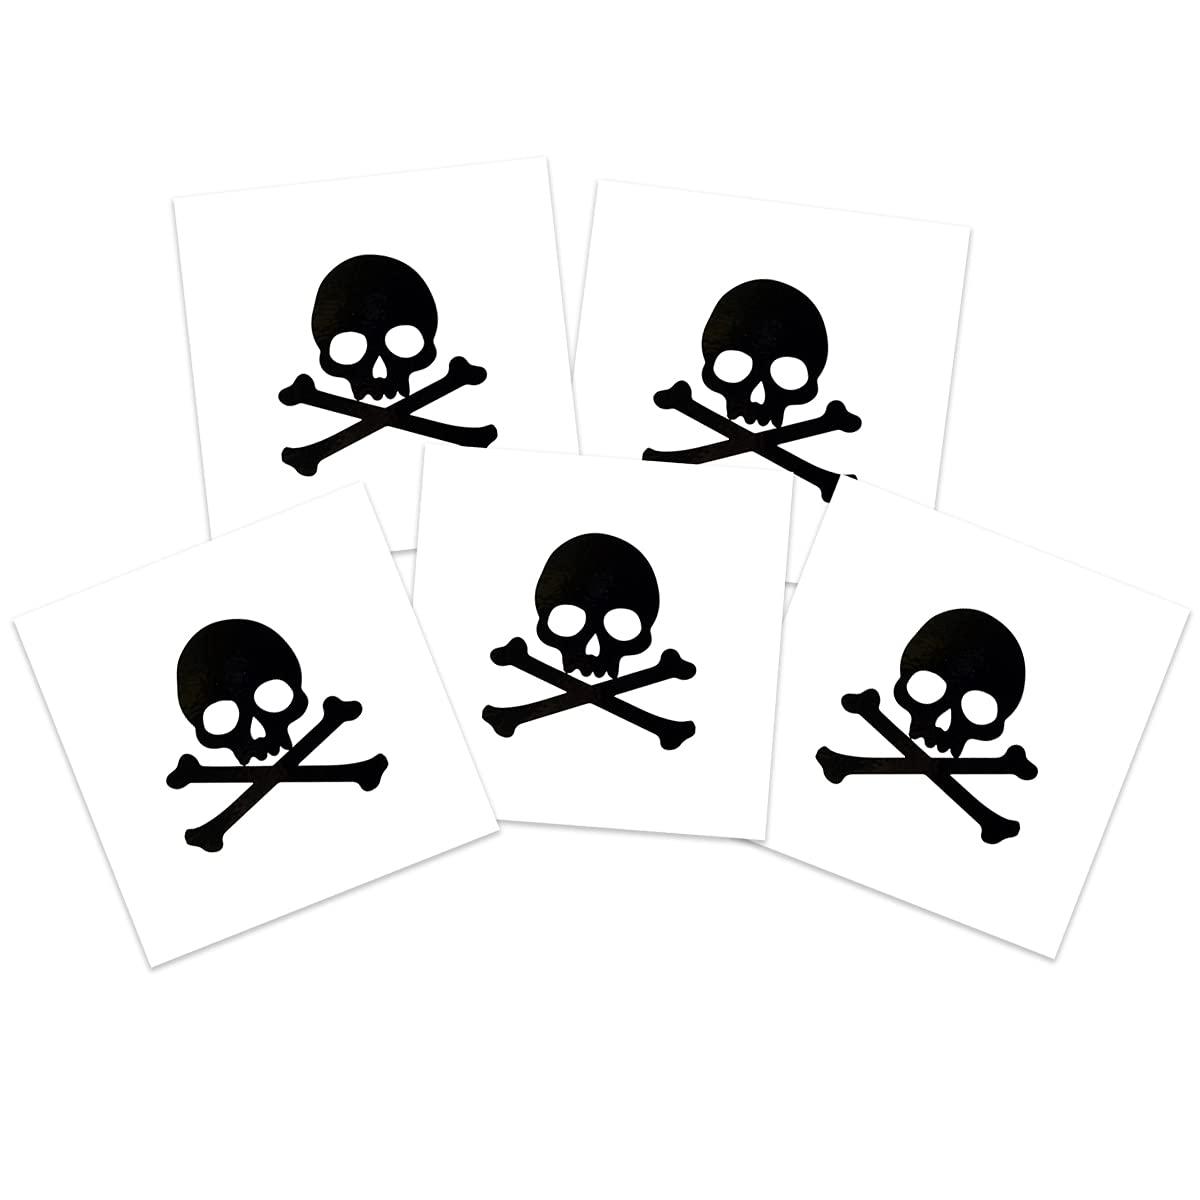 Black Skull Crossbones Very popular Temporary 5-Pack Safe Skin Tattoos Our shop most popular